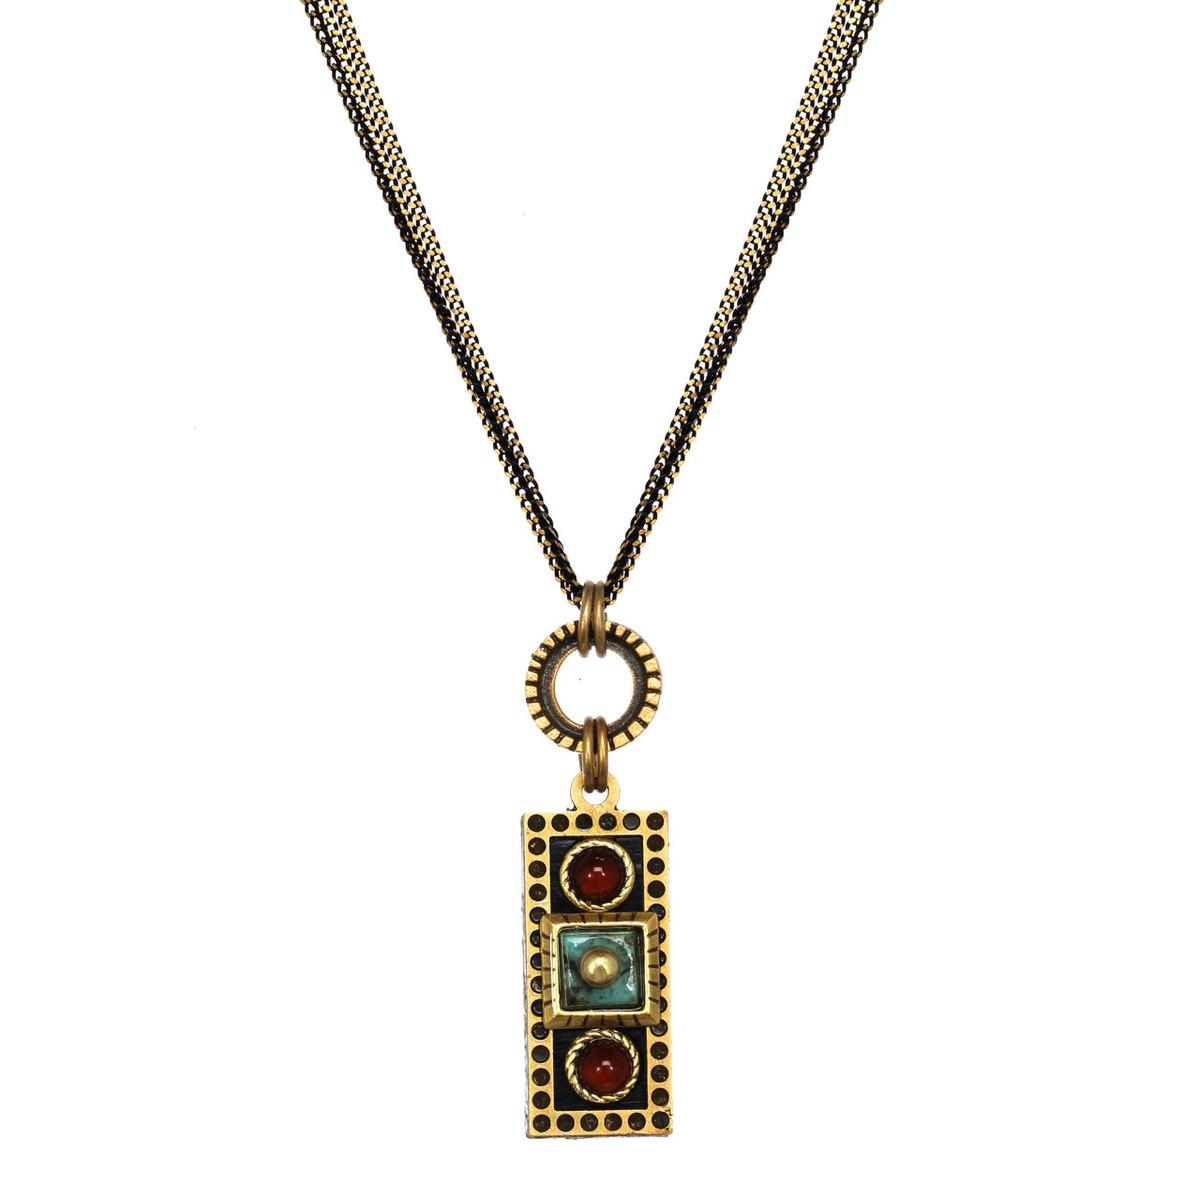 Michal Golan Earth Teal Long Bar Pendant Necklace